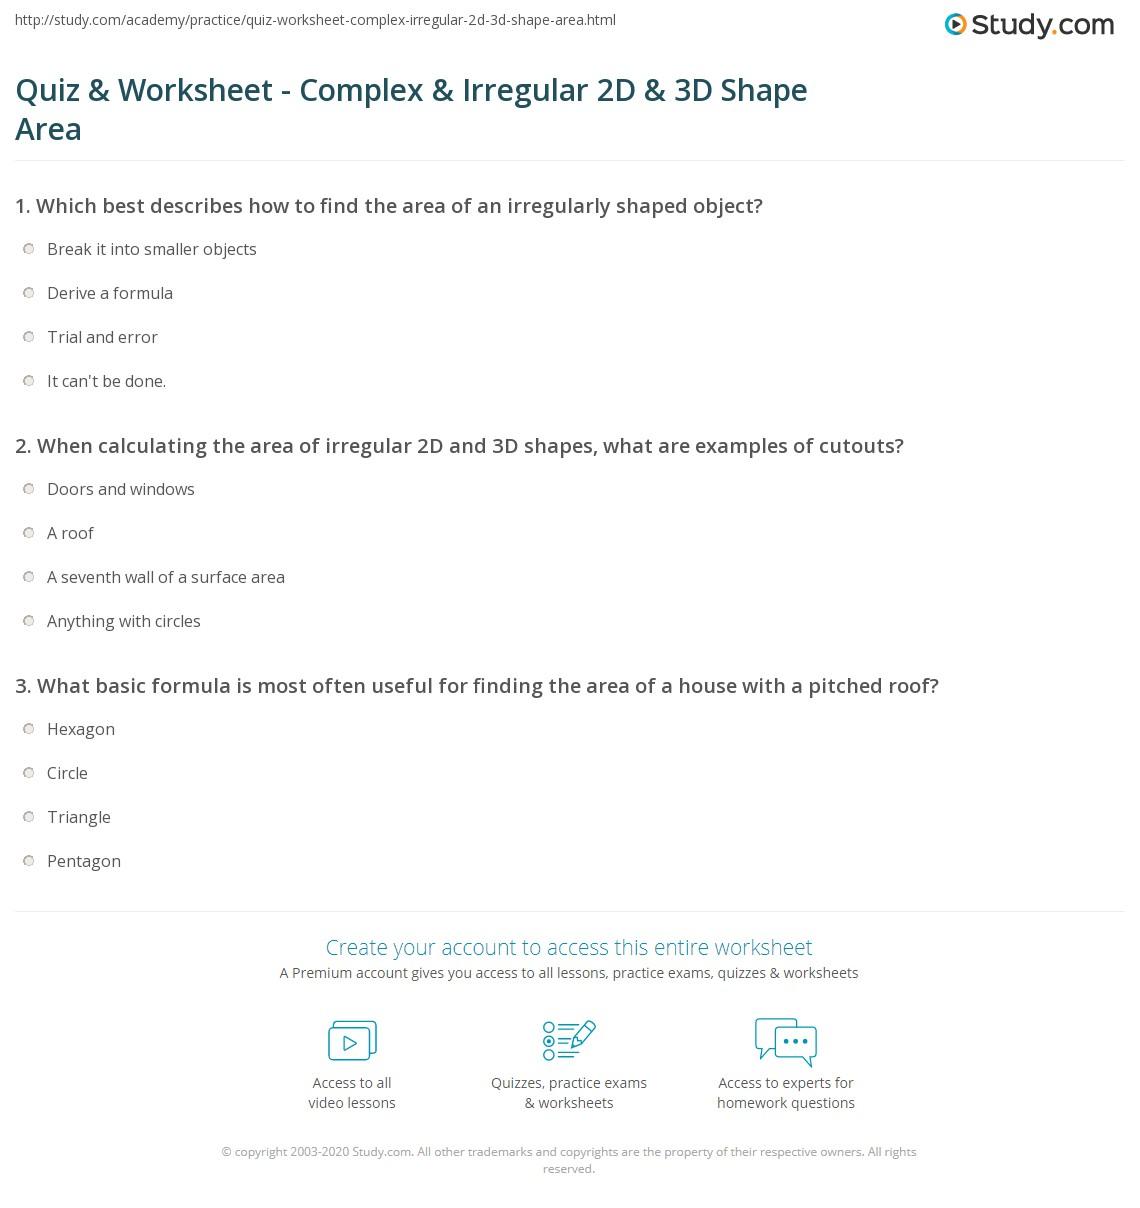 Quiz Worksheet Complex Irregular 2D 3D Shape Area – 2d and 3d Shapes Worksheets